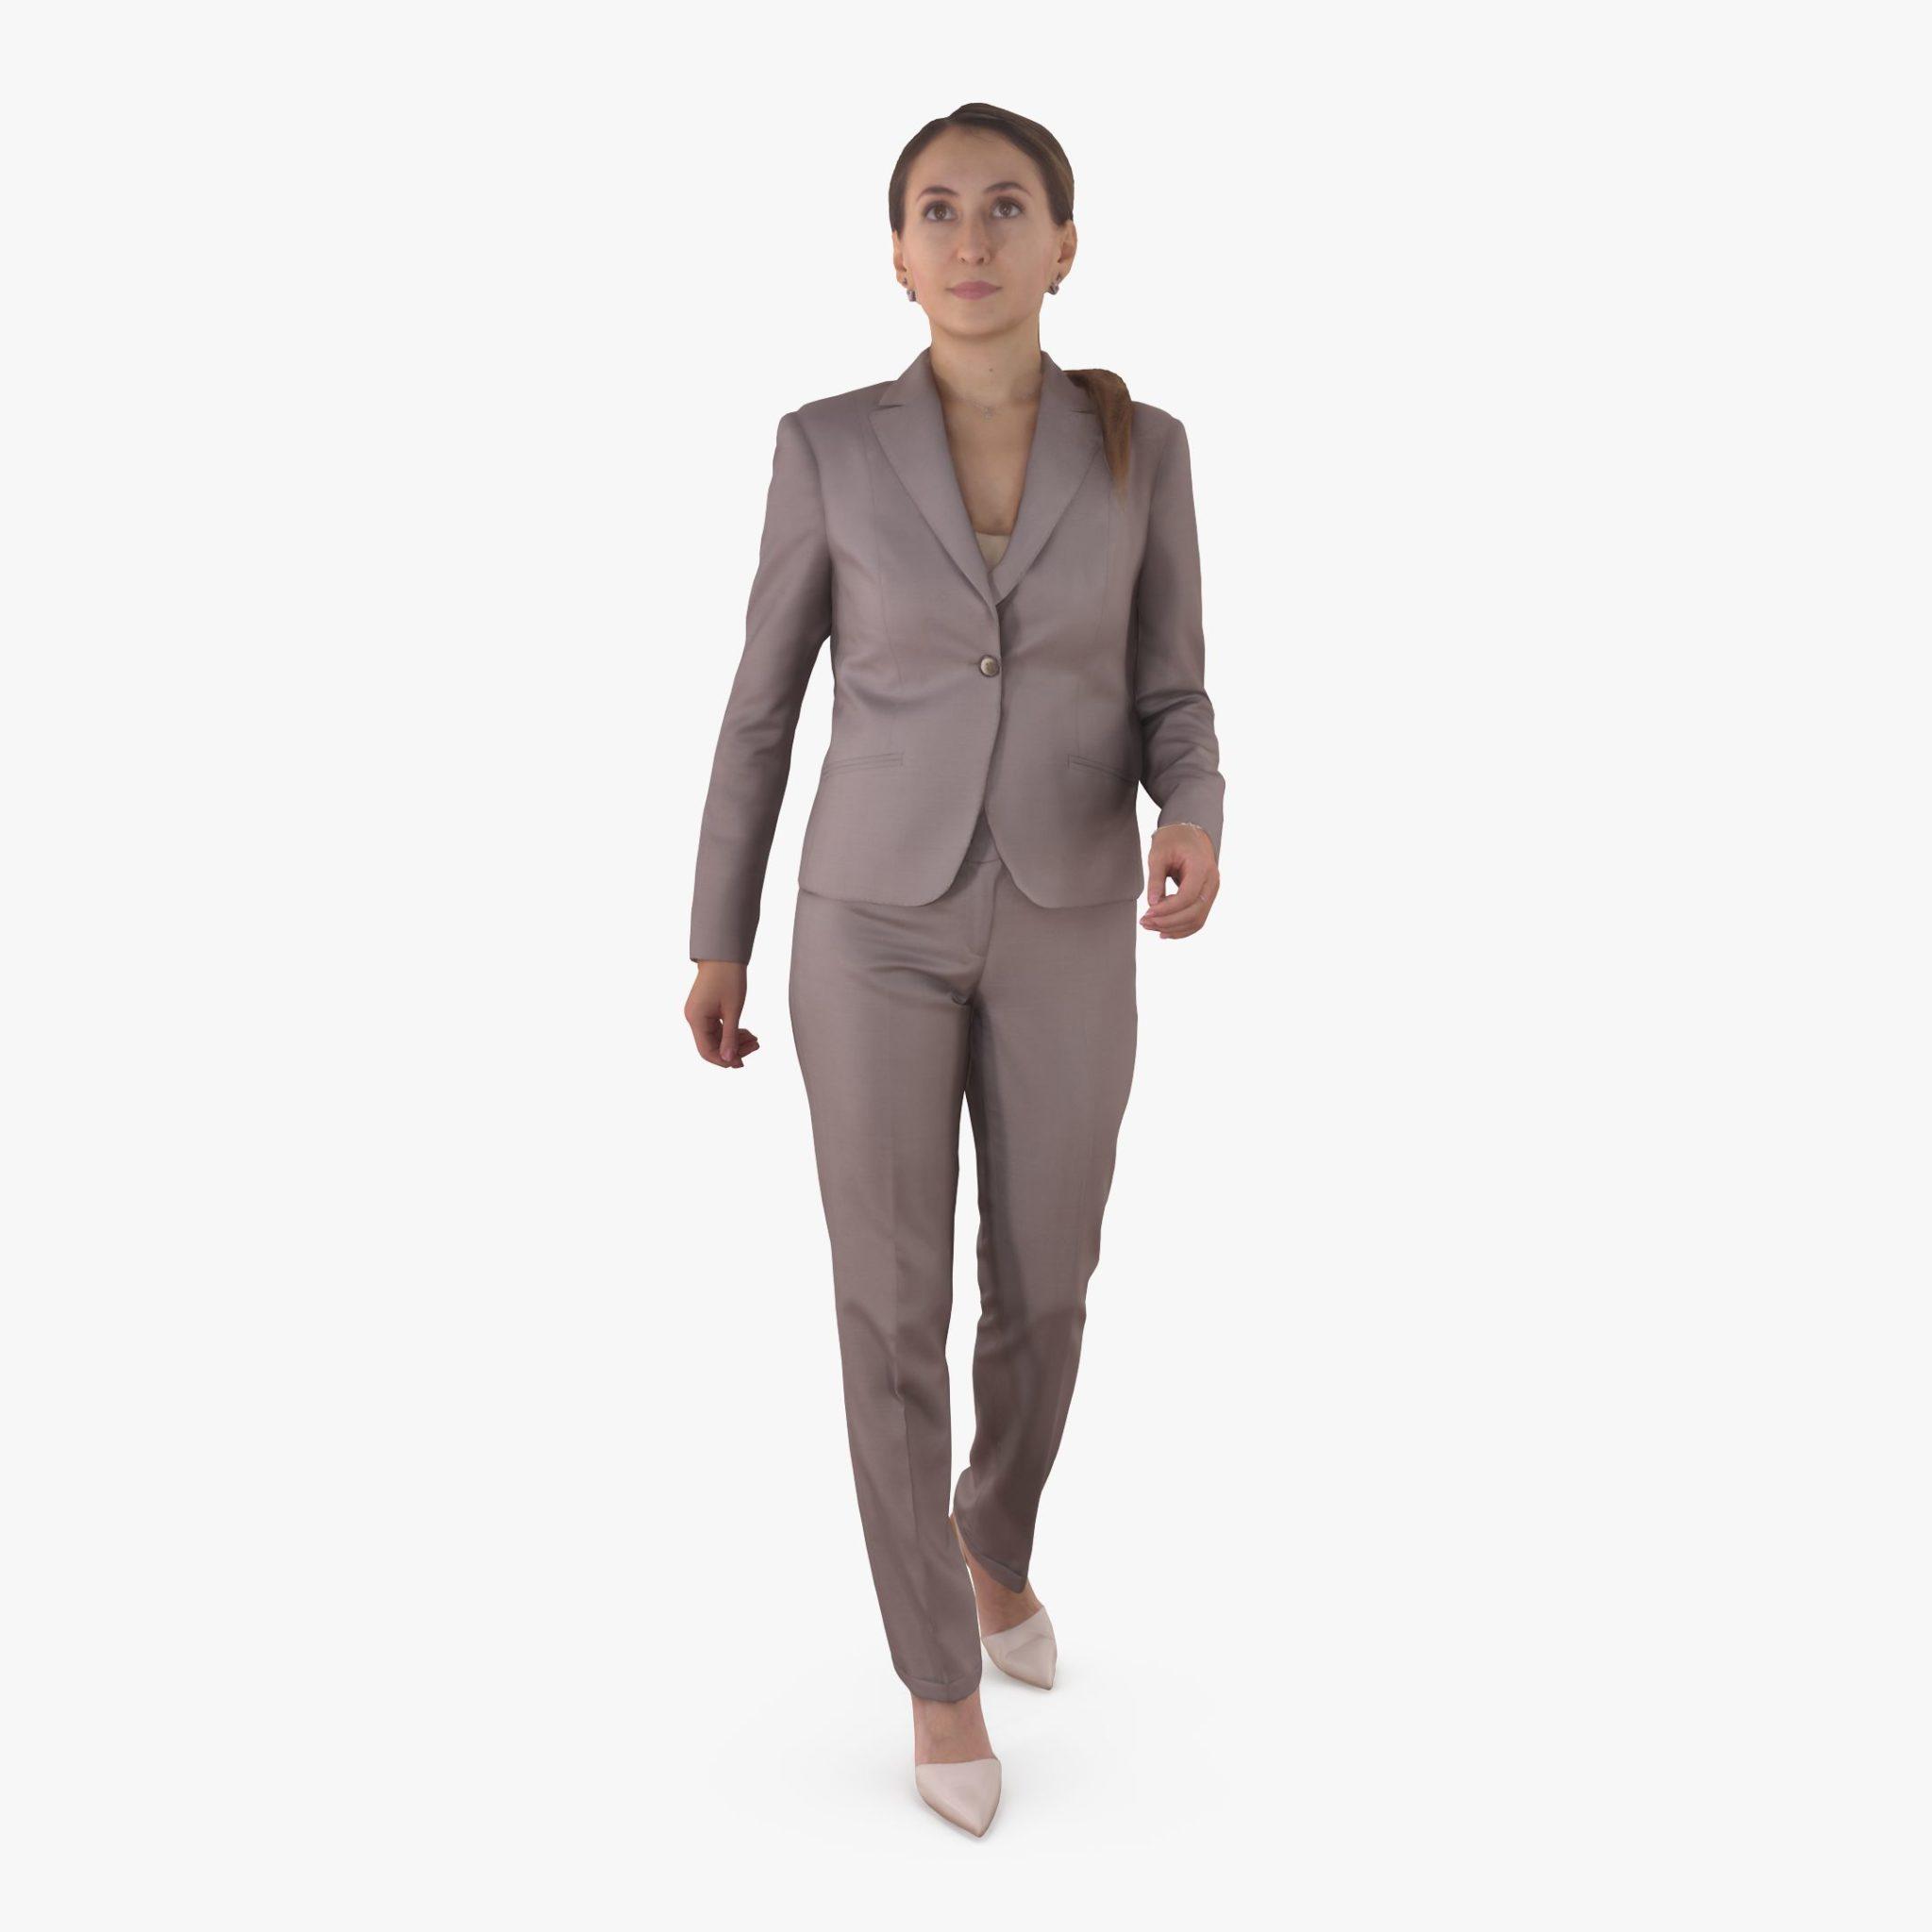 Business Woman Active 3D Model | 3DTree Scanning Studio